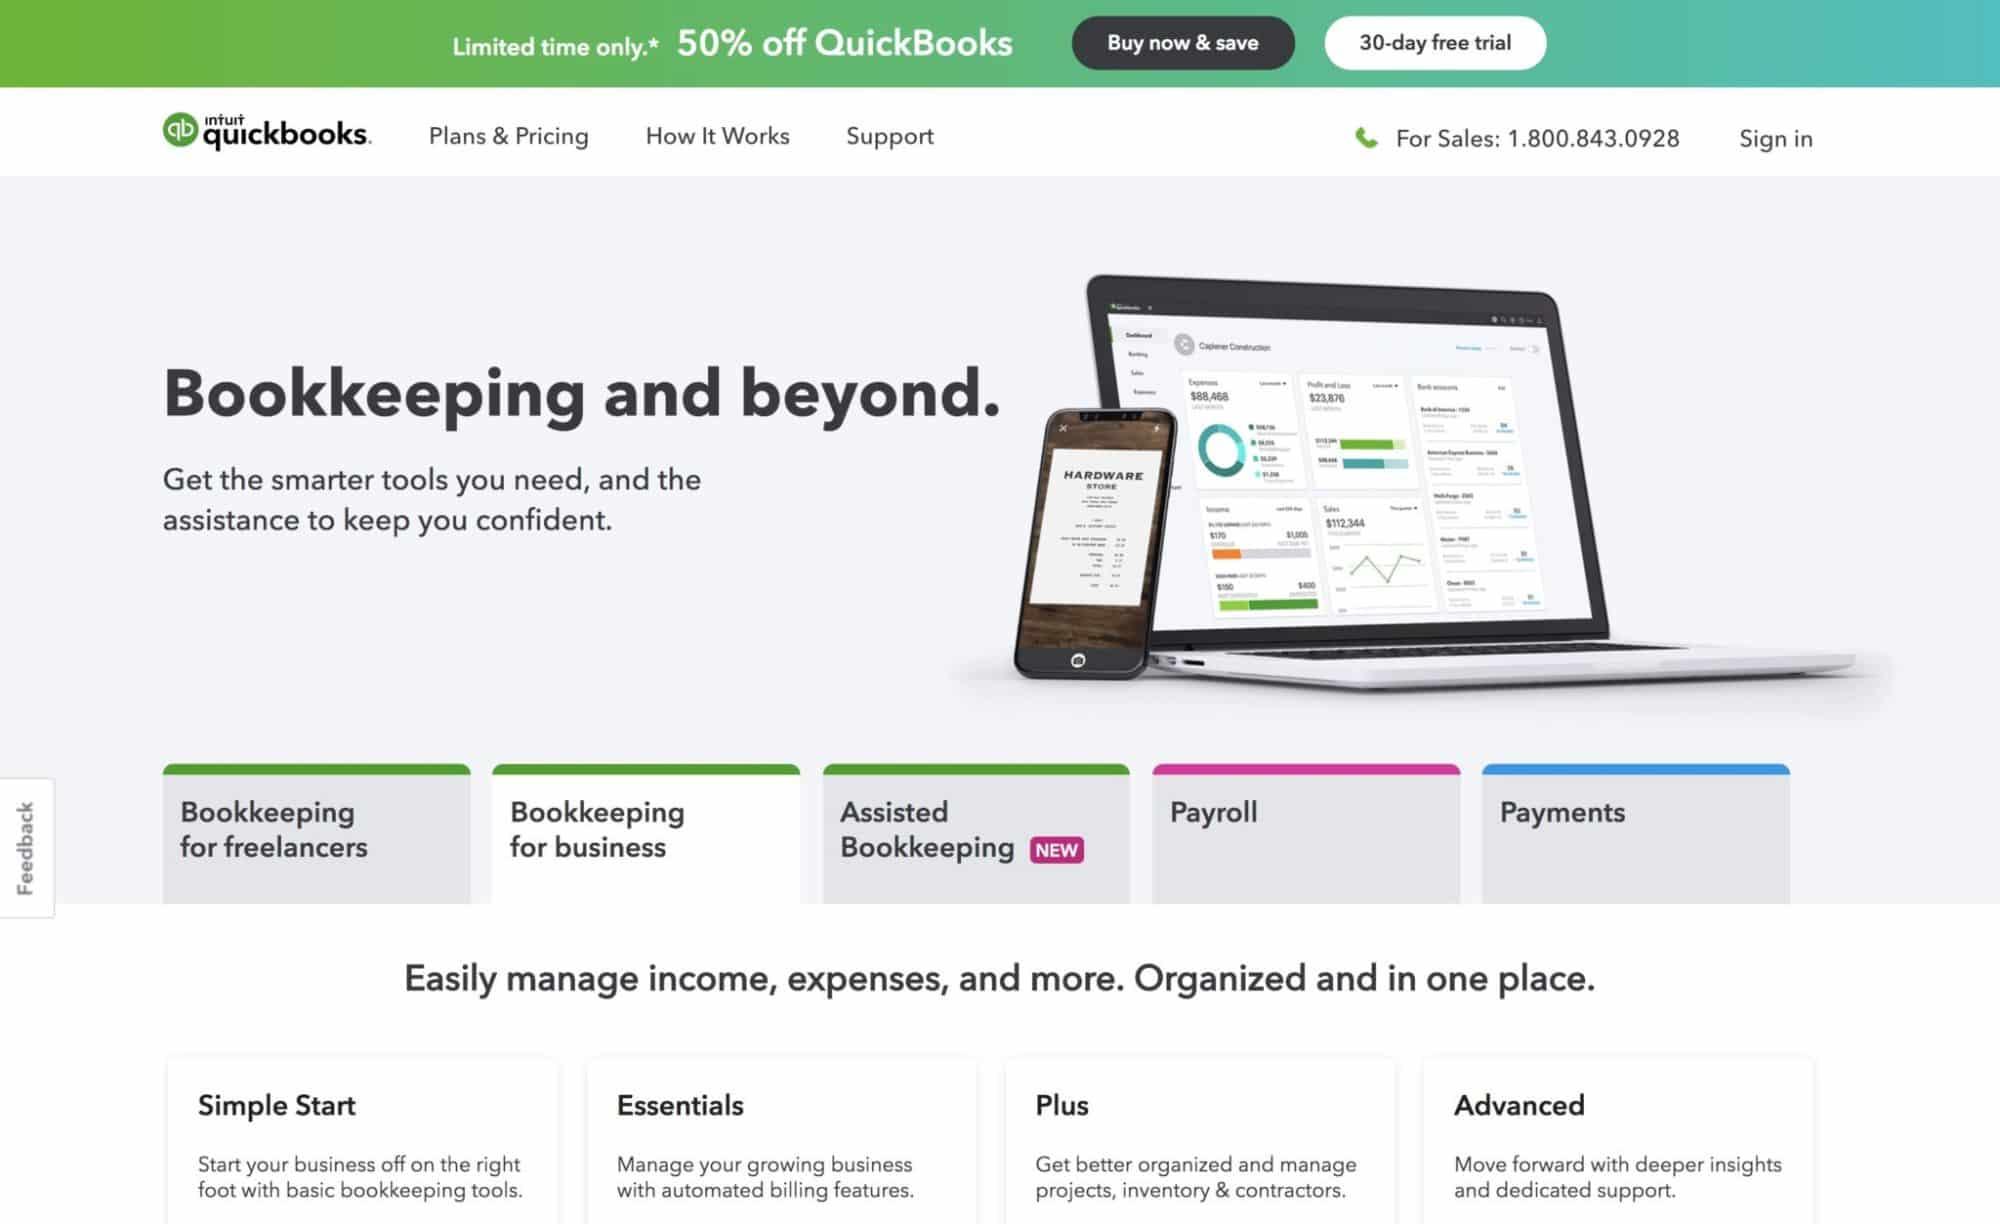 Quickbooks Marketing - Website Design for Technology, Financial SAAS B2B Companies